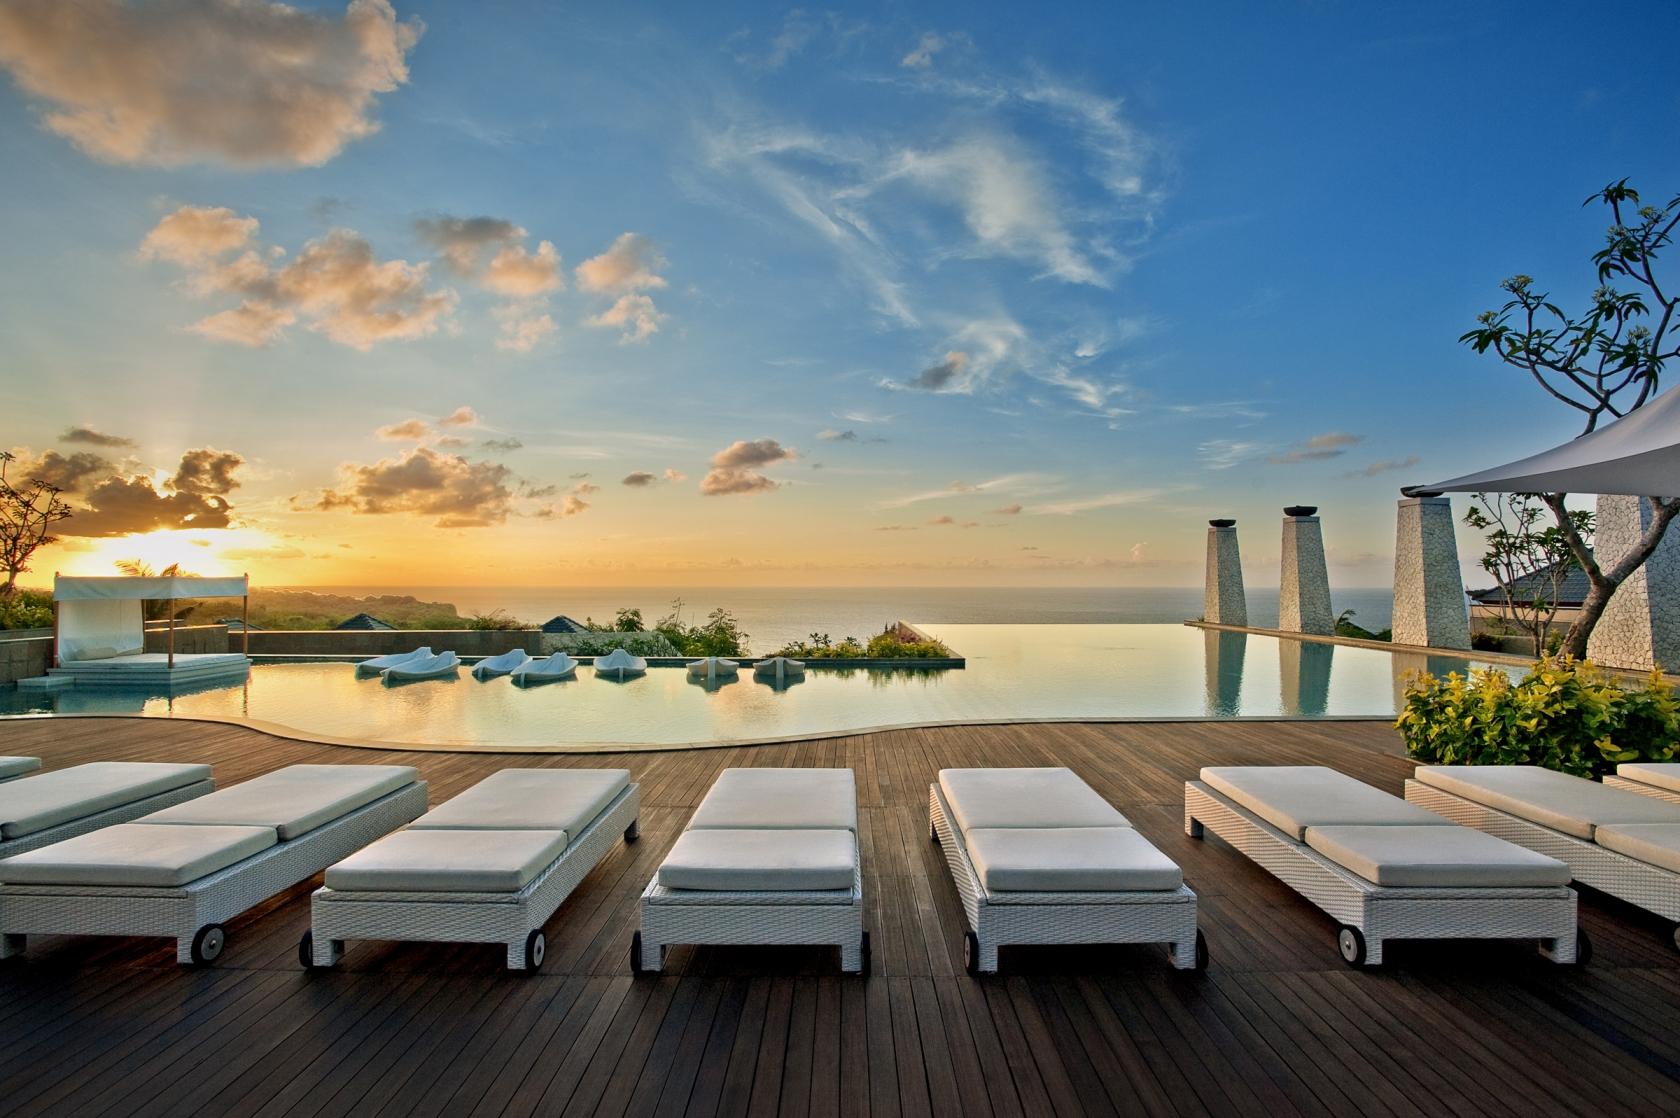 TIDUG Bali Getaway Poolside Sunset 池边日落